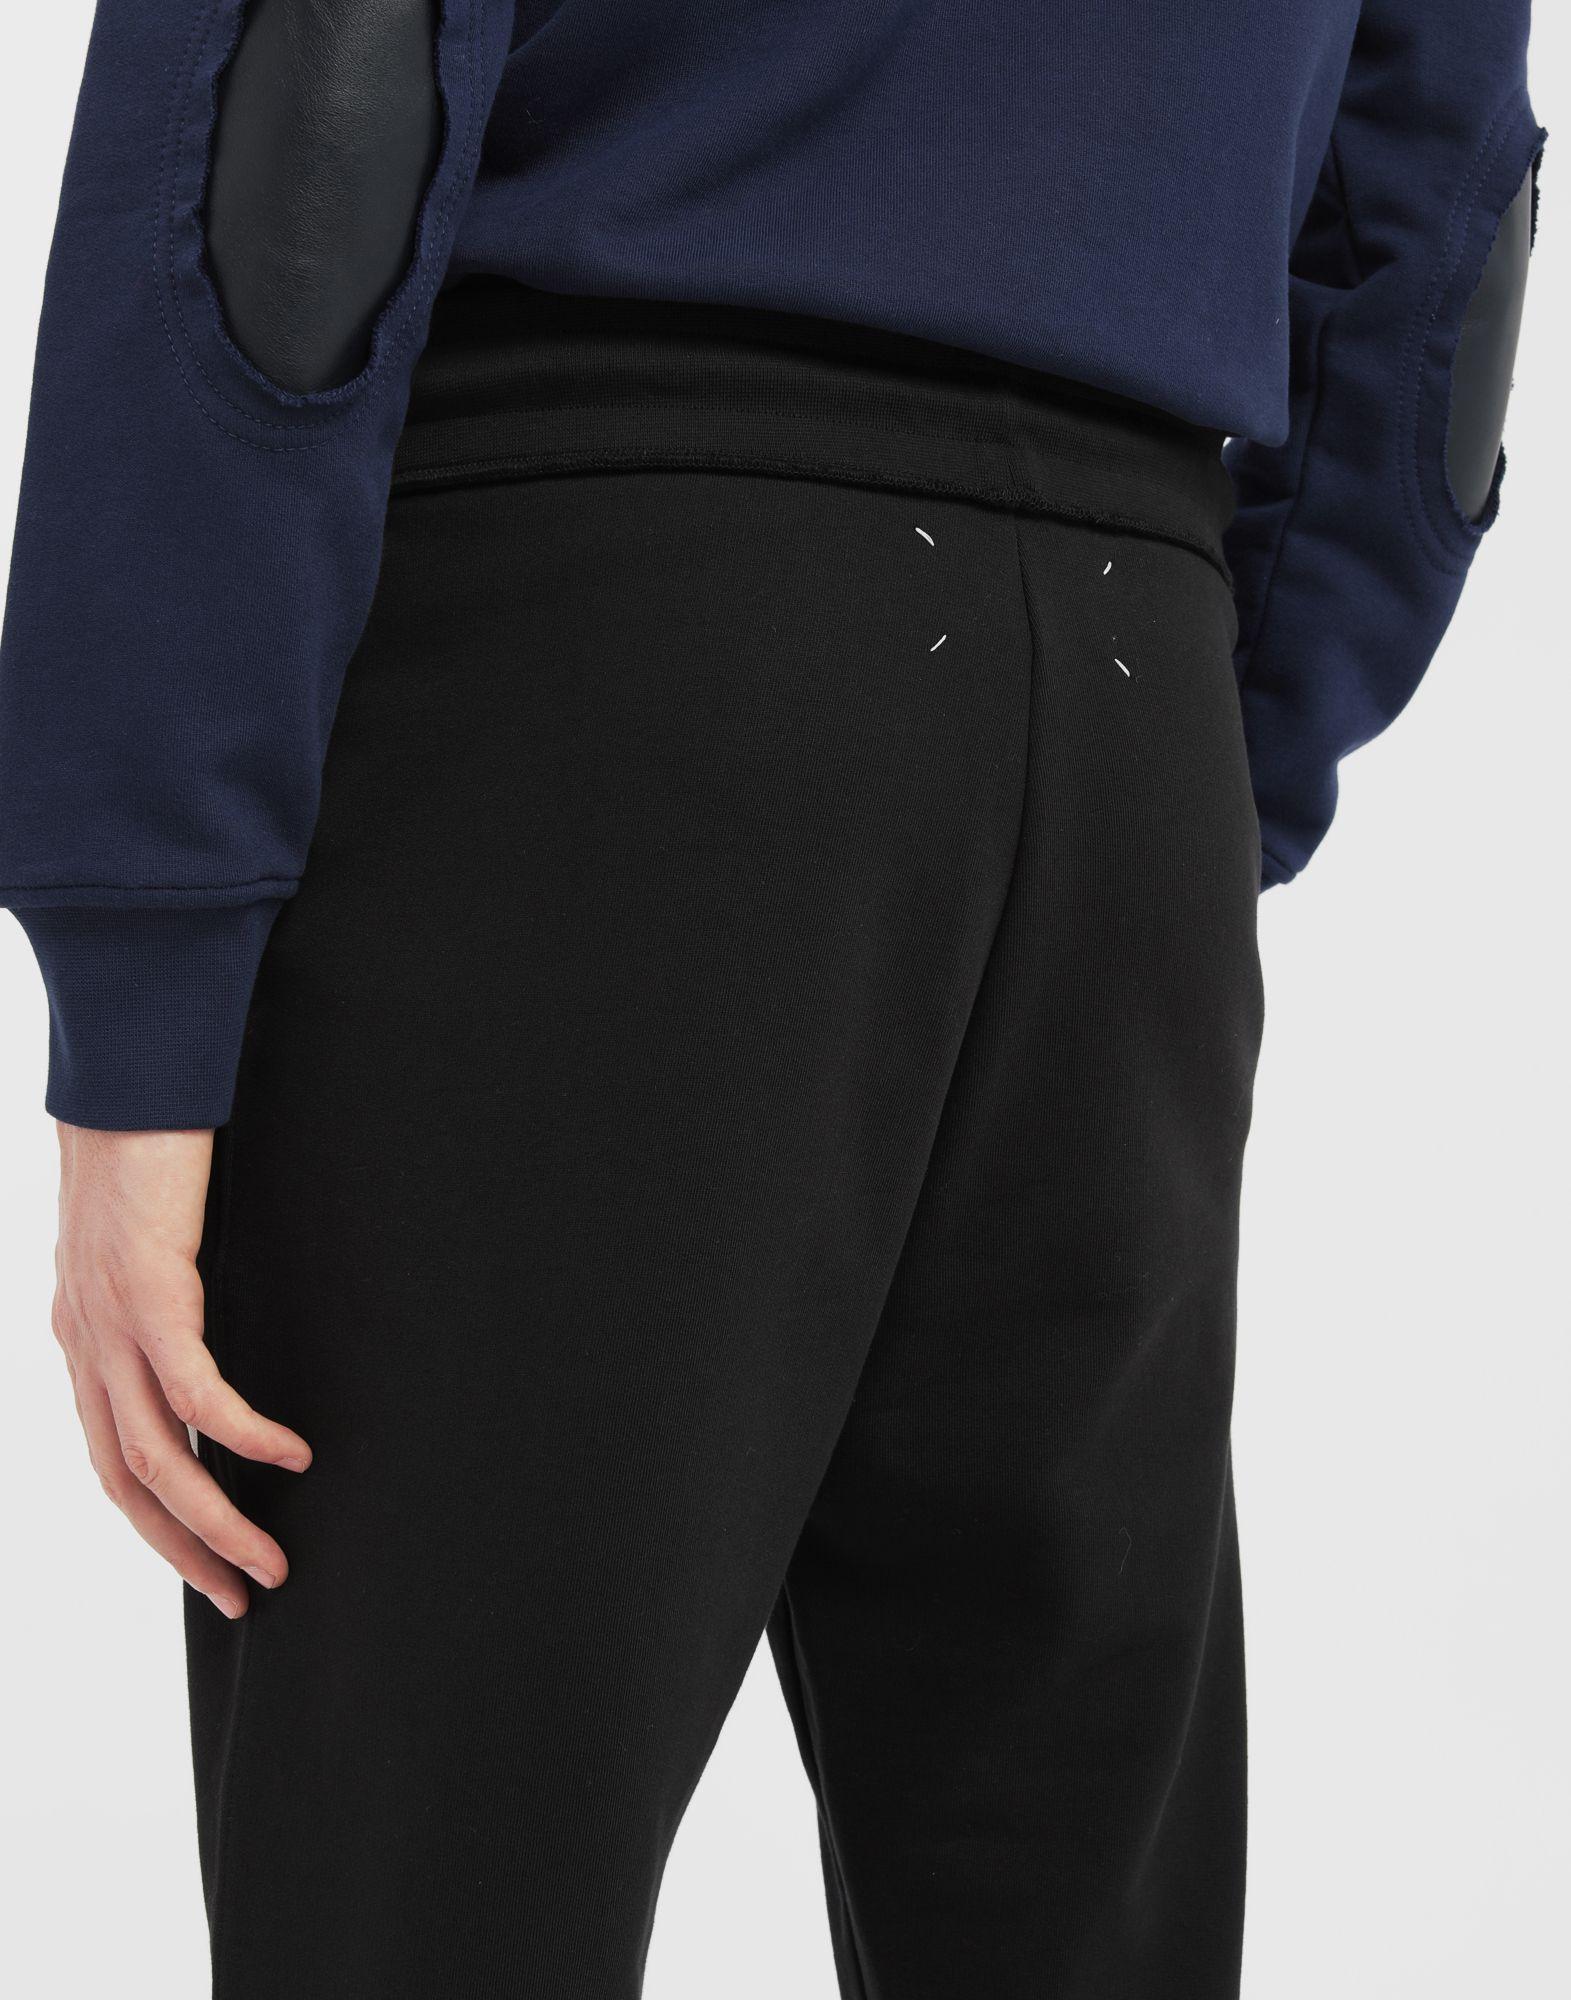 MAISON MARGIELA Stereotype jogging pants Trousers Man b